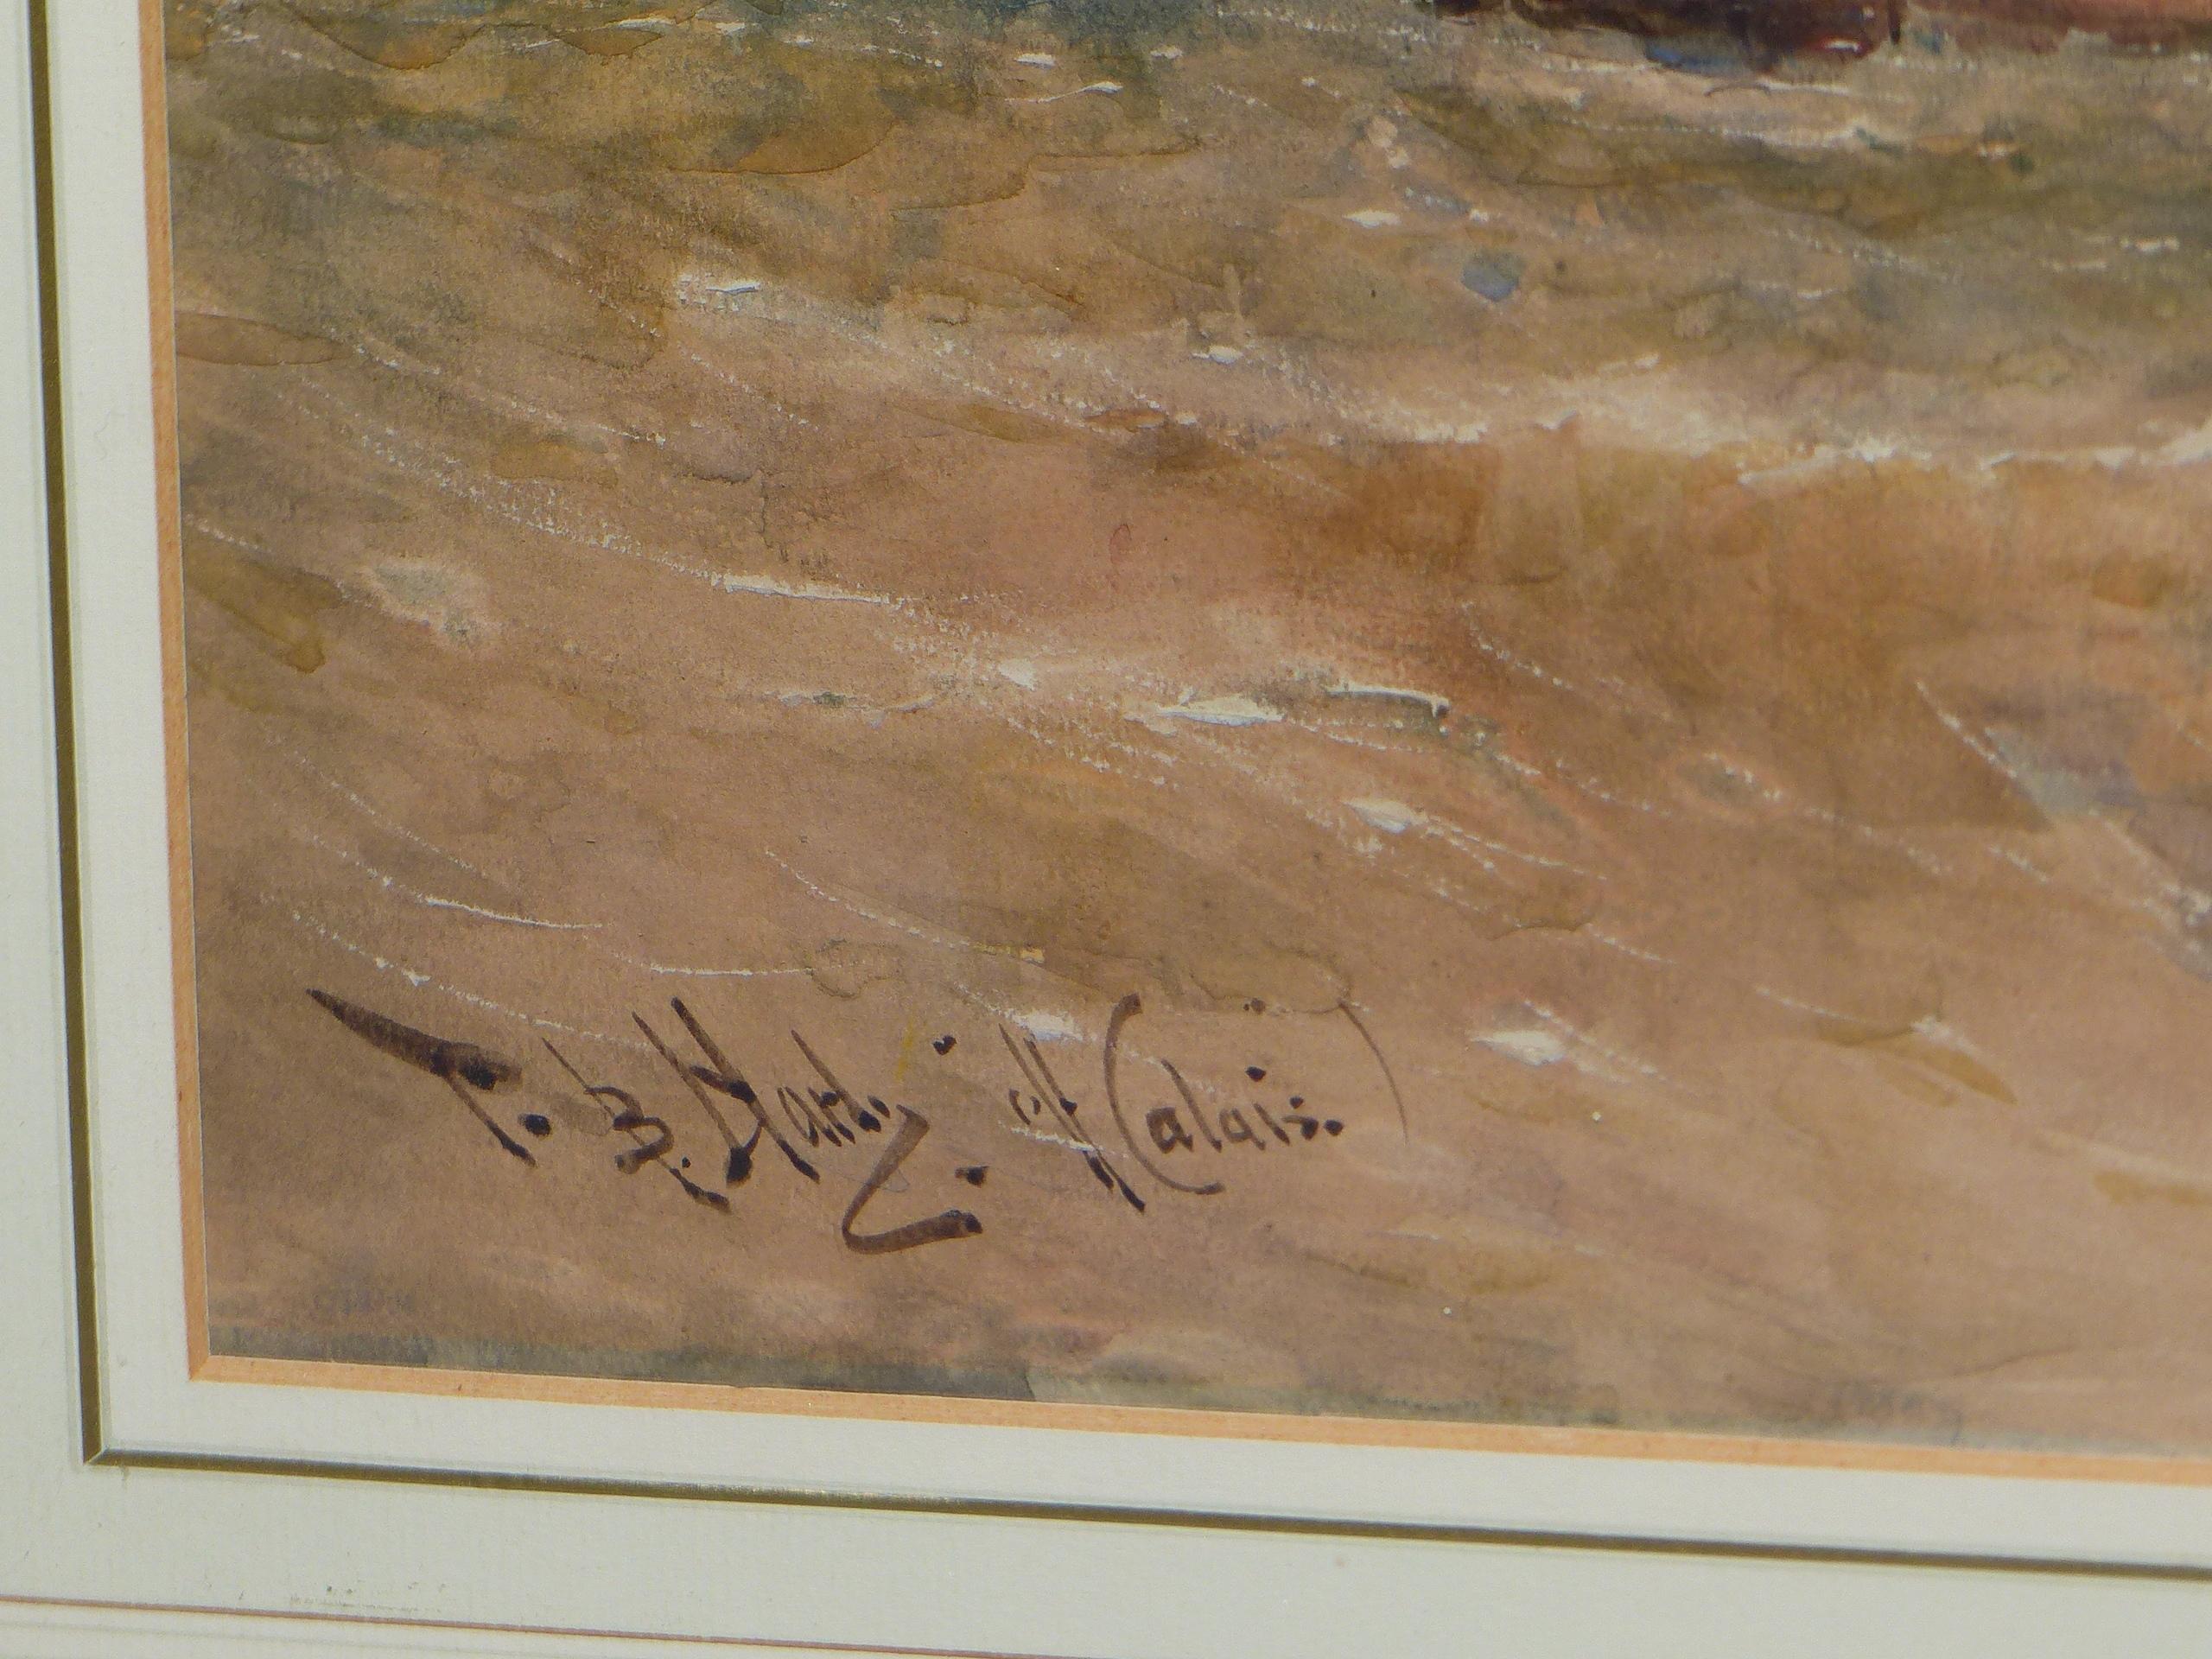 THOMAS BUSH HARDY (1842 - 1897). SHIPPING OFF CALAIS, SIGNED WATERCOLOUR, 40 x 68cms. - Image 3 of 6